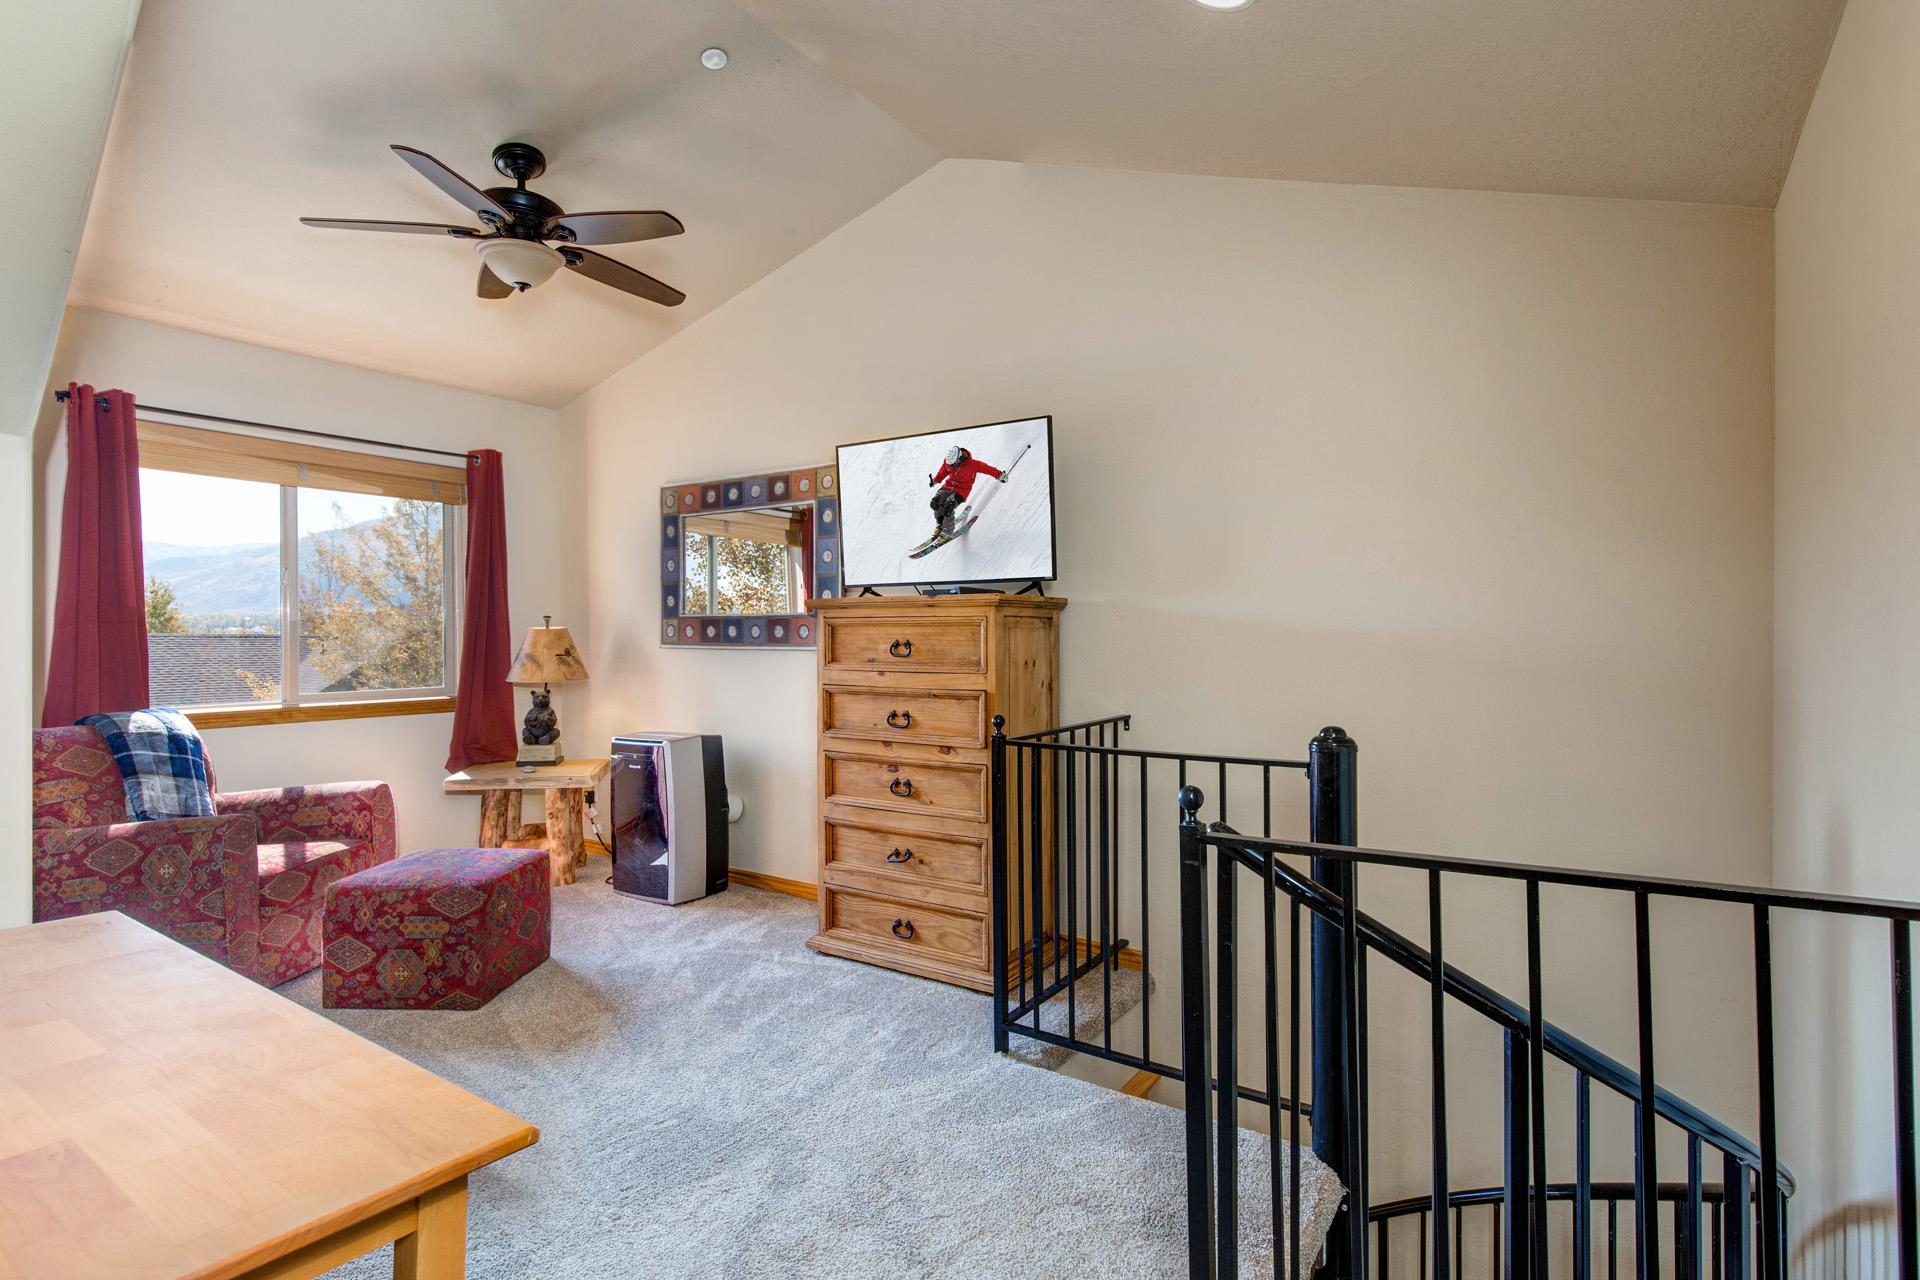 Bear Hollow Village 5441-202 - Park City, Utah